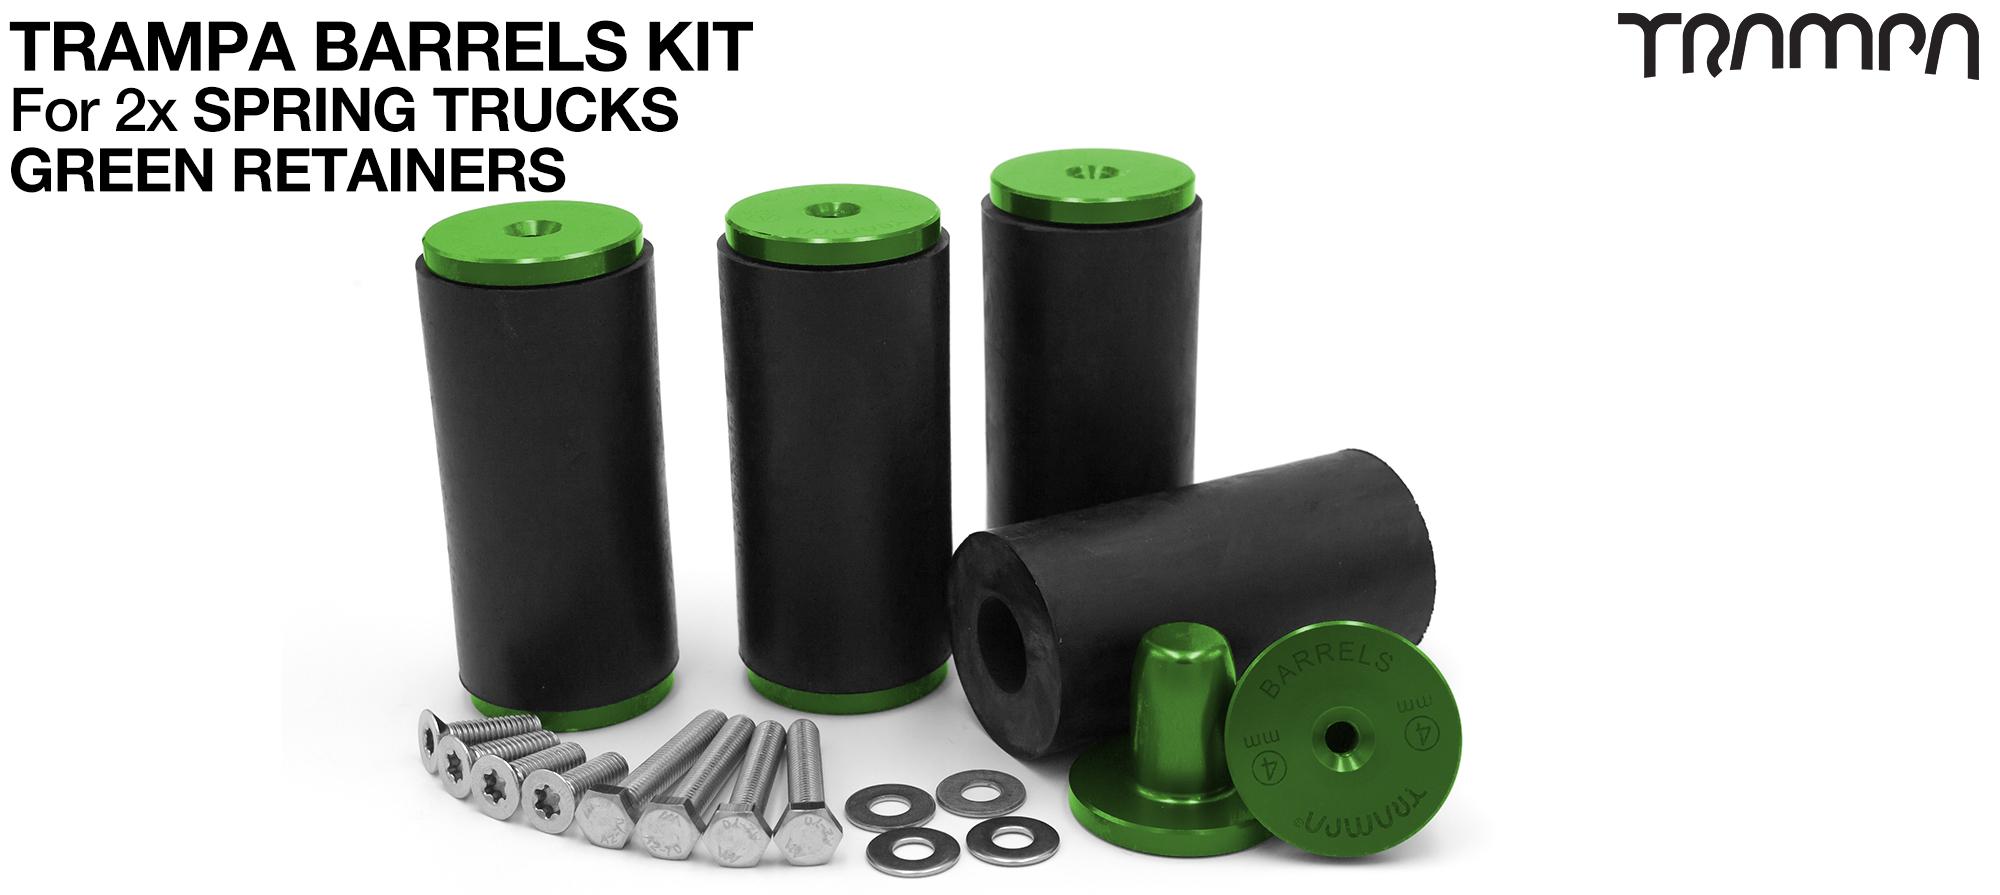 TRAMPA BARRELS Complete DECK Kit - GREEN